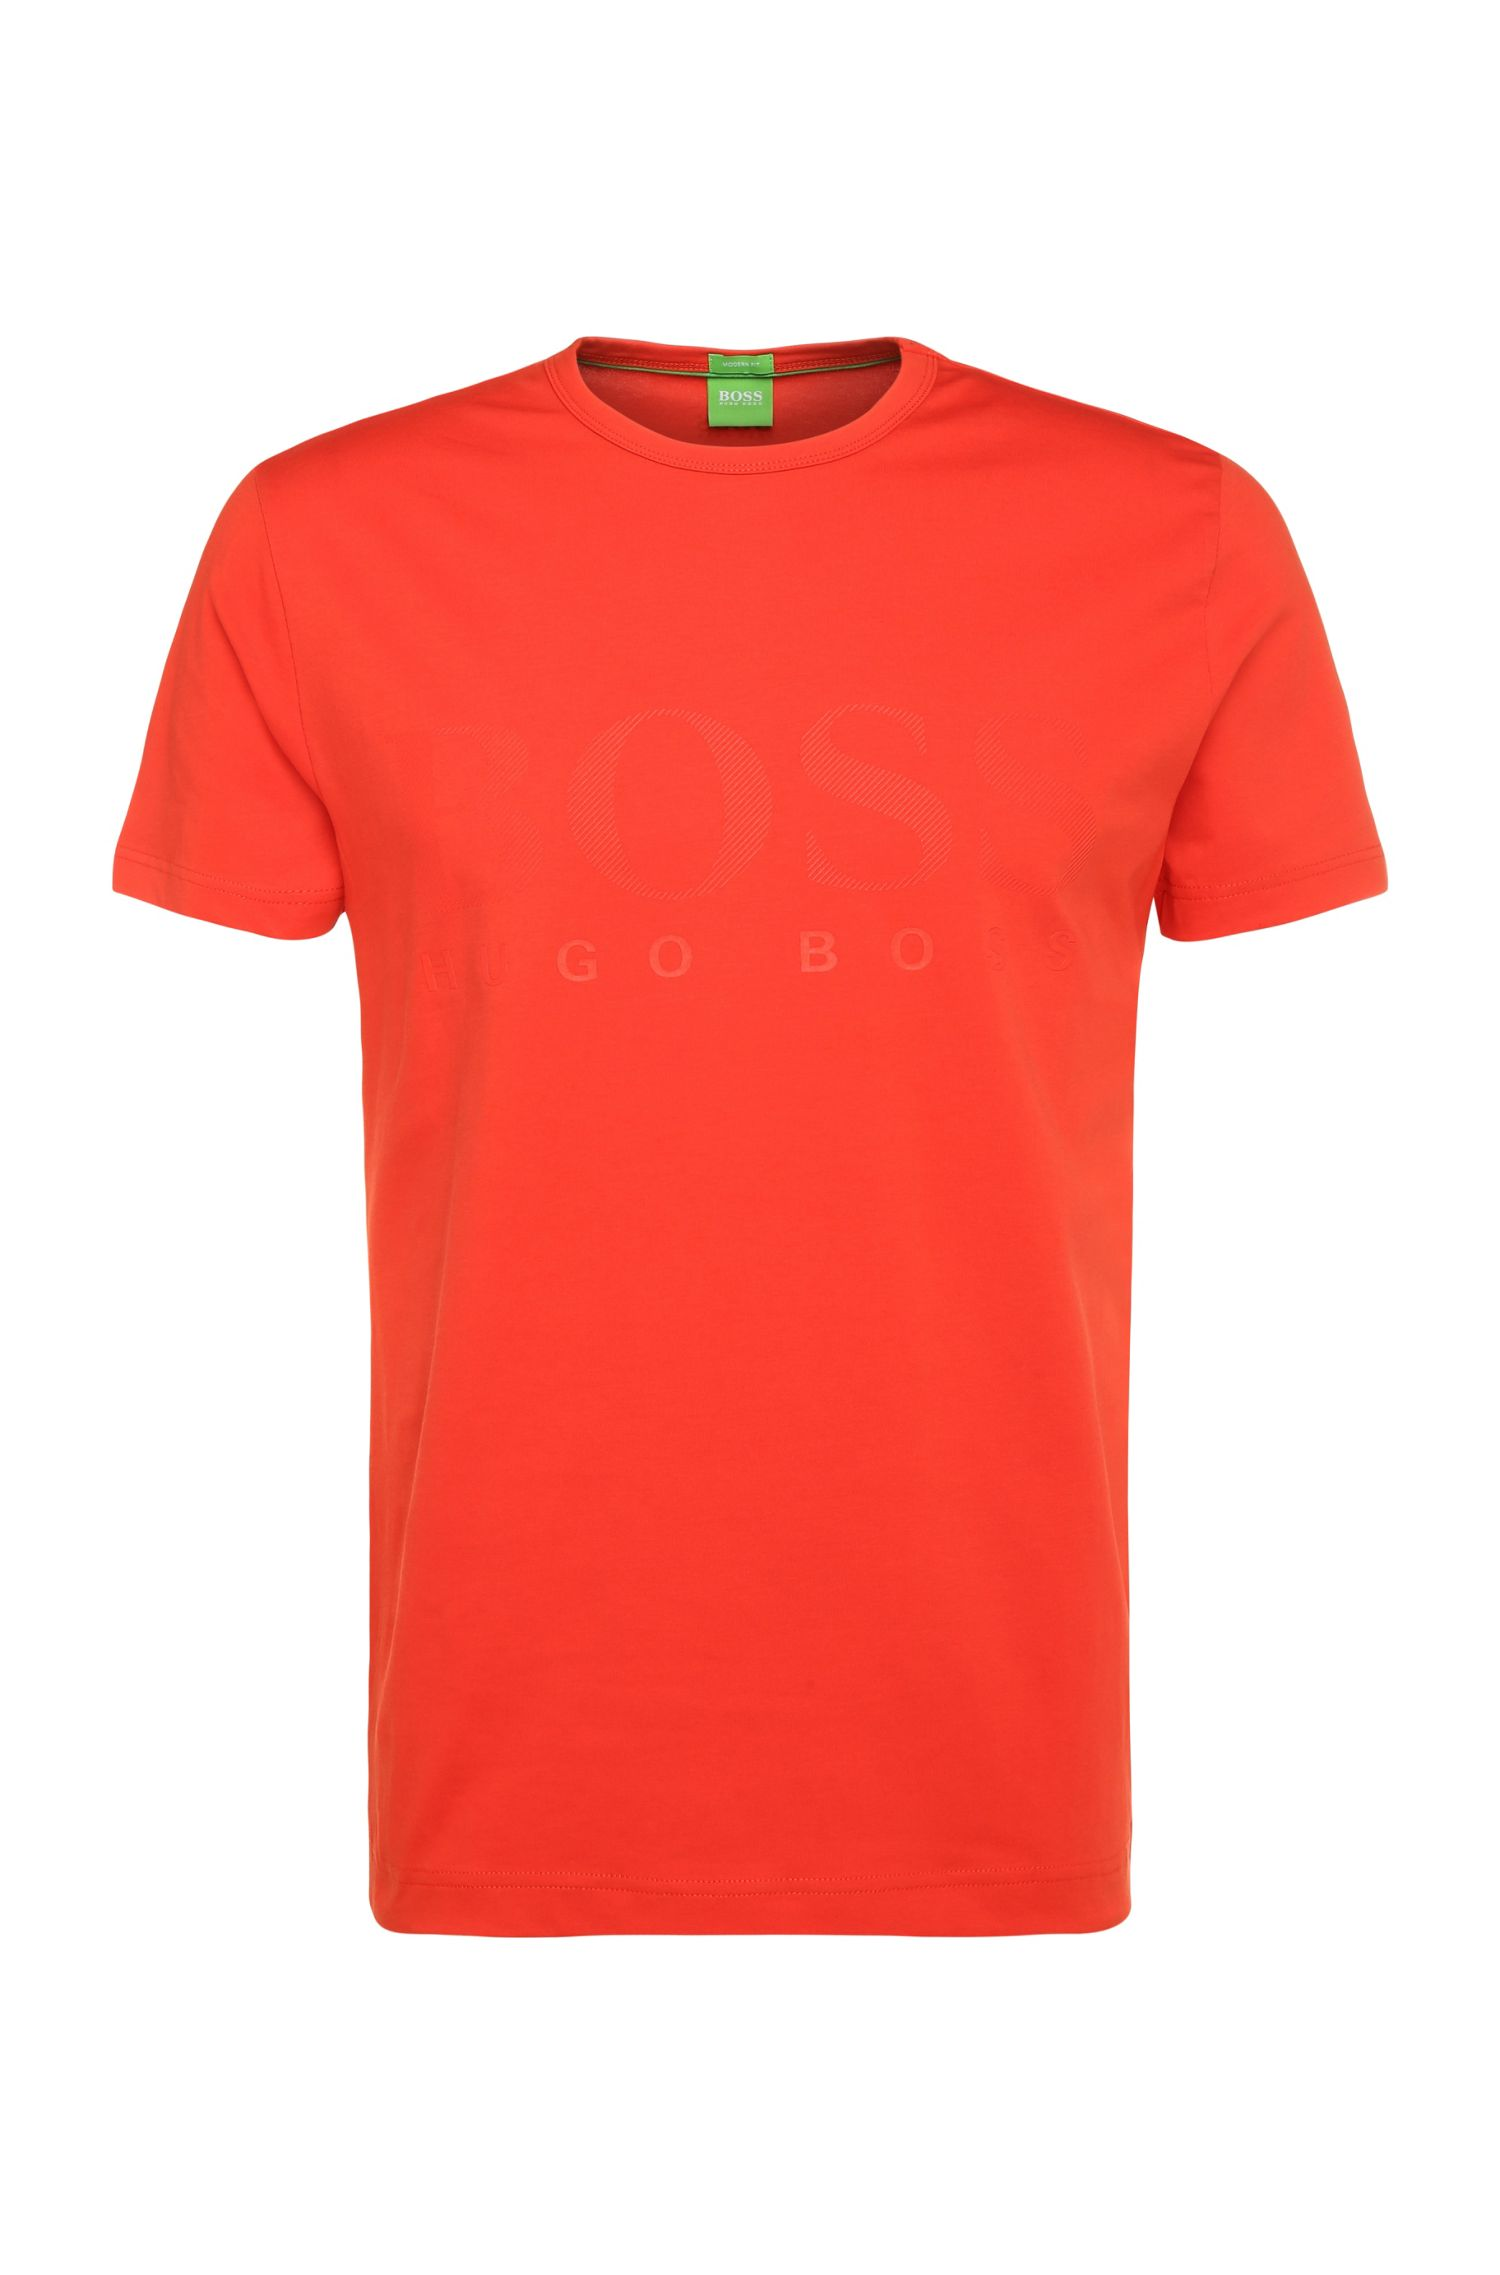 T-Shirt ´Tee US` aus Baumwoll-Elasthan-Mix